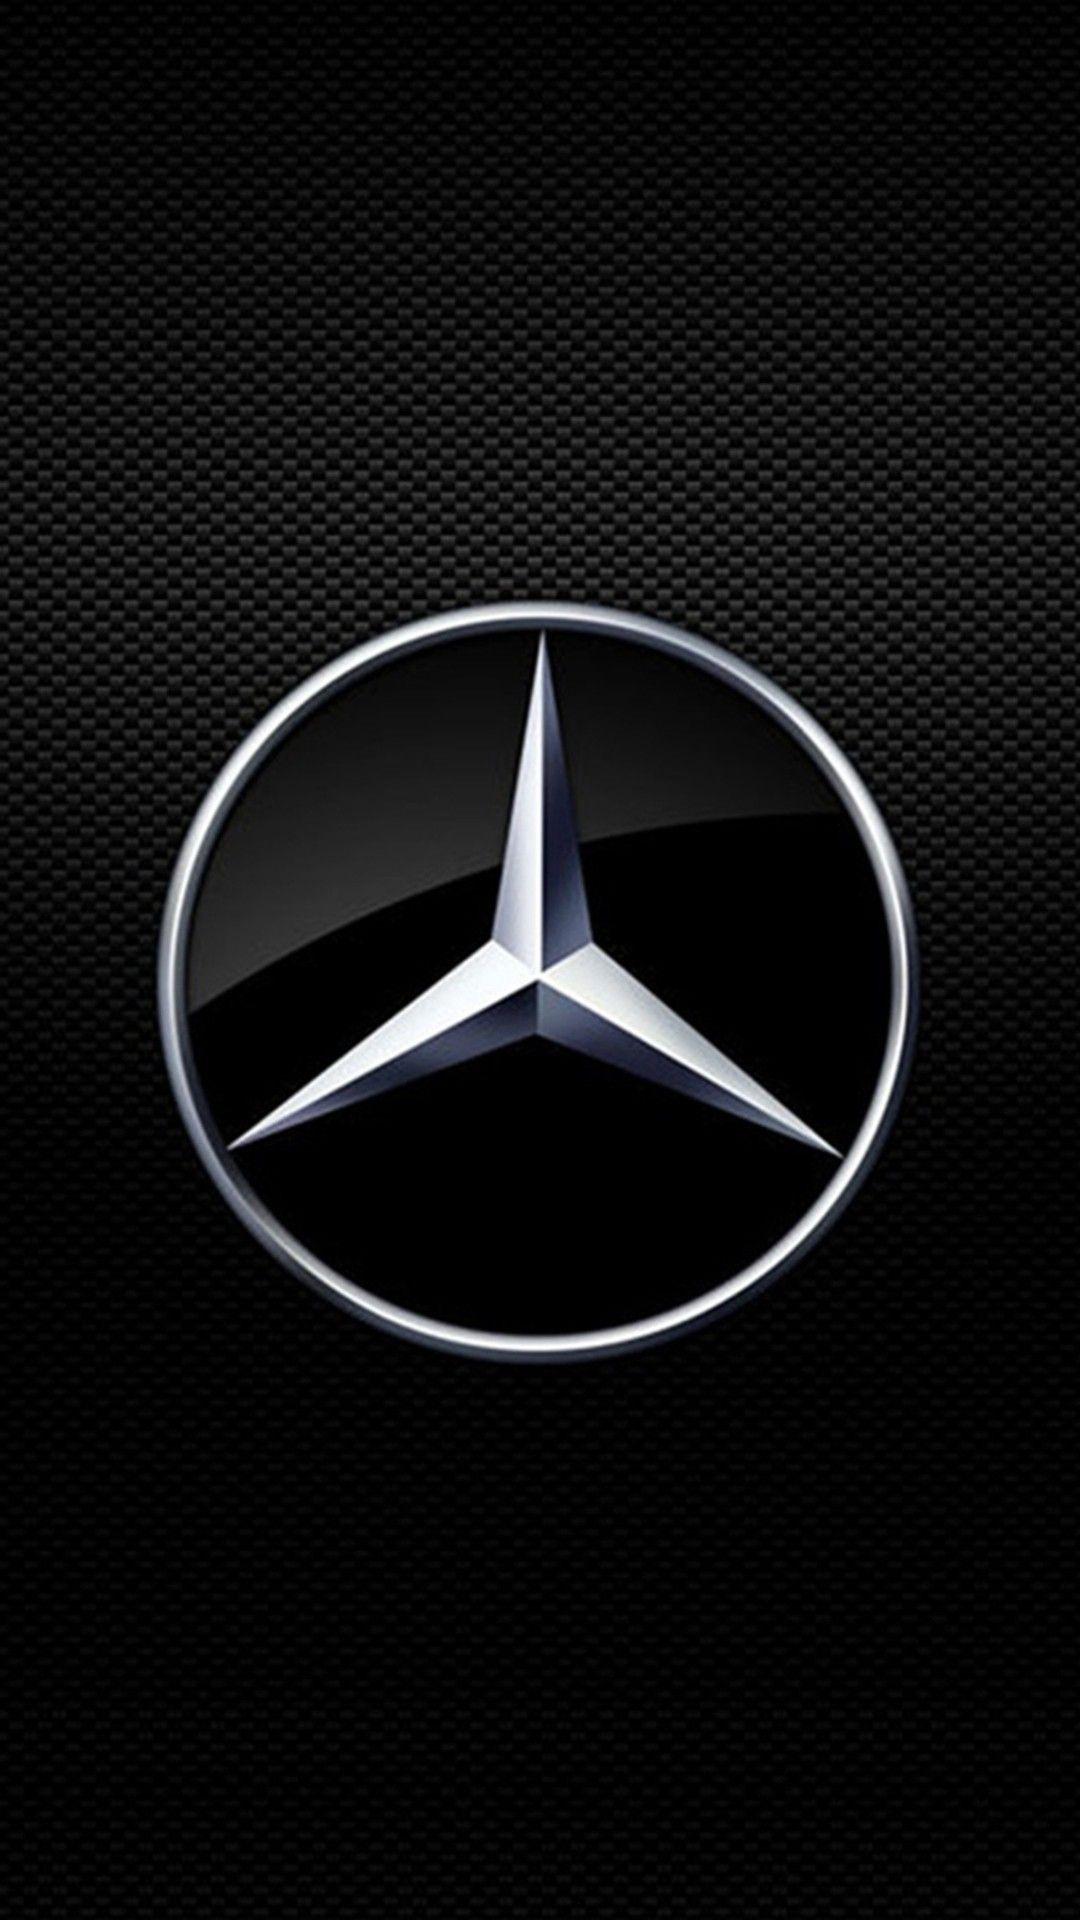 Fond D Ecran Mercedes Logos De Voitures Voiture Mercedes Mercedes Benz Amg